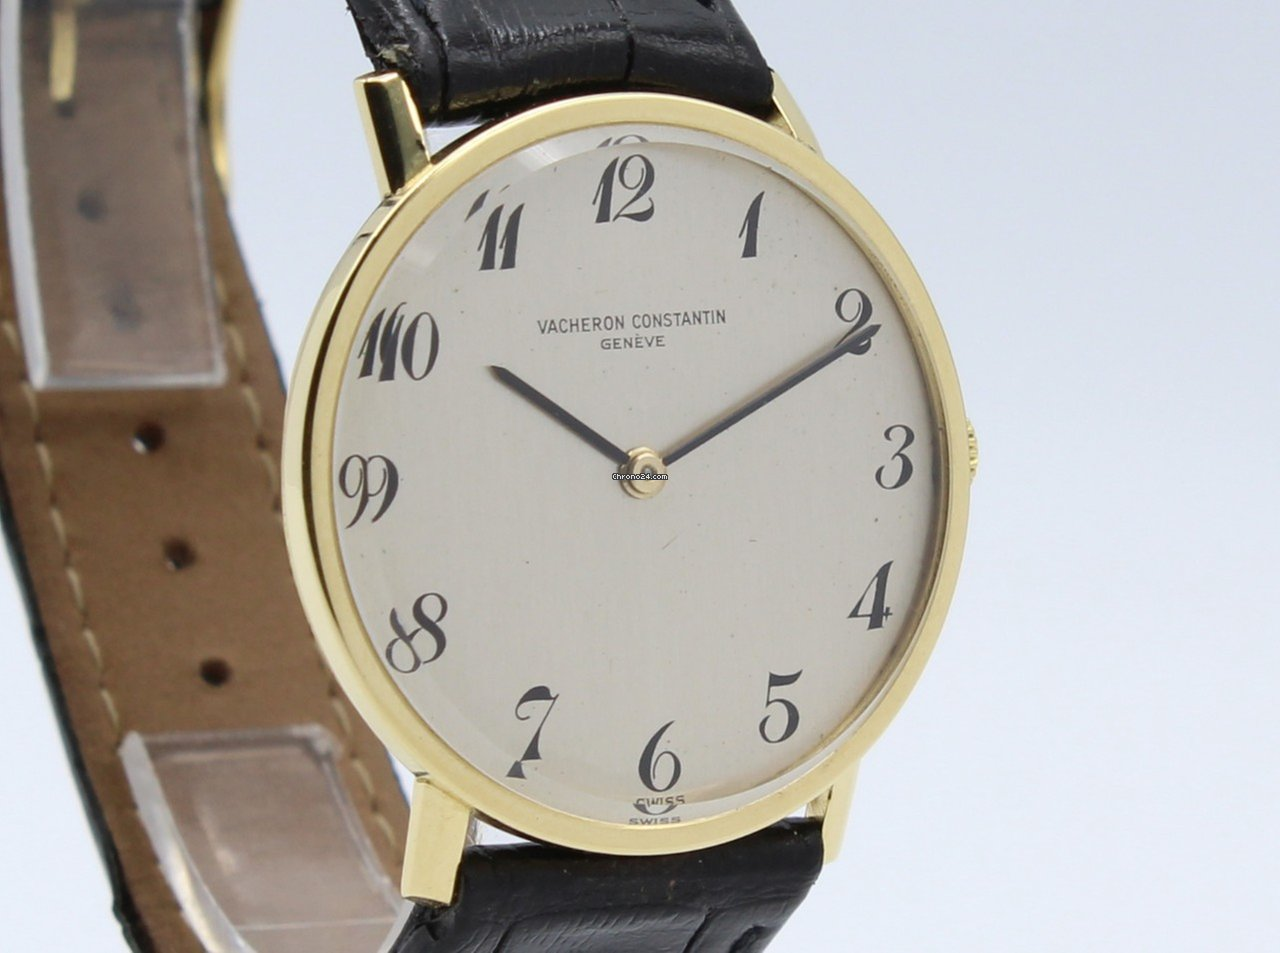 995b7e9d57f7 Relojes Vacheron Constantin - Precios de todos los relojes Vacheron  Constantin en Chrono24